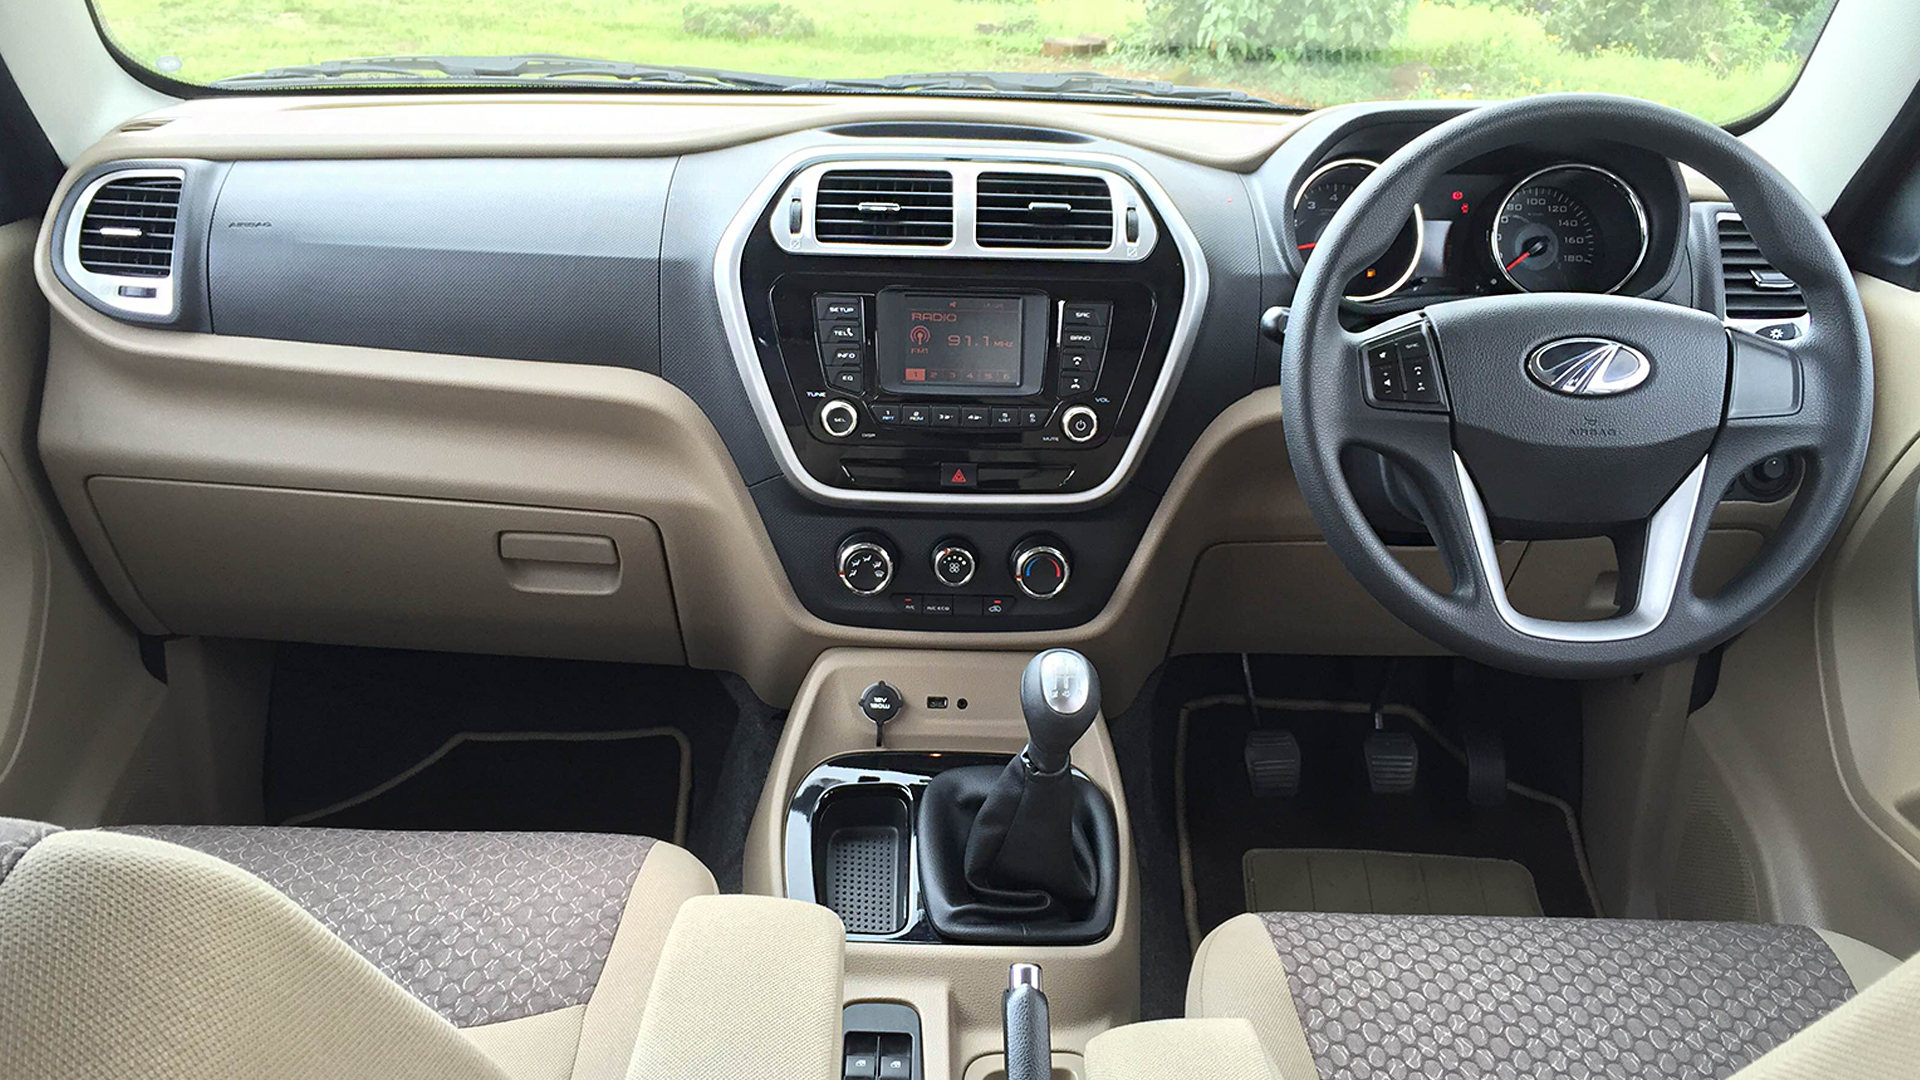 Mahindra TUV300 2016 T8 100PS Interior